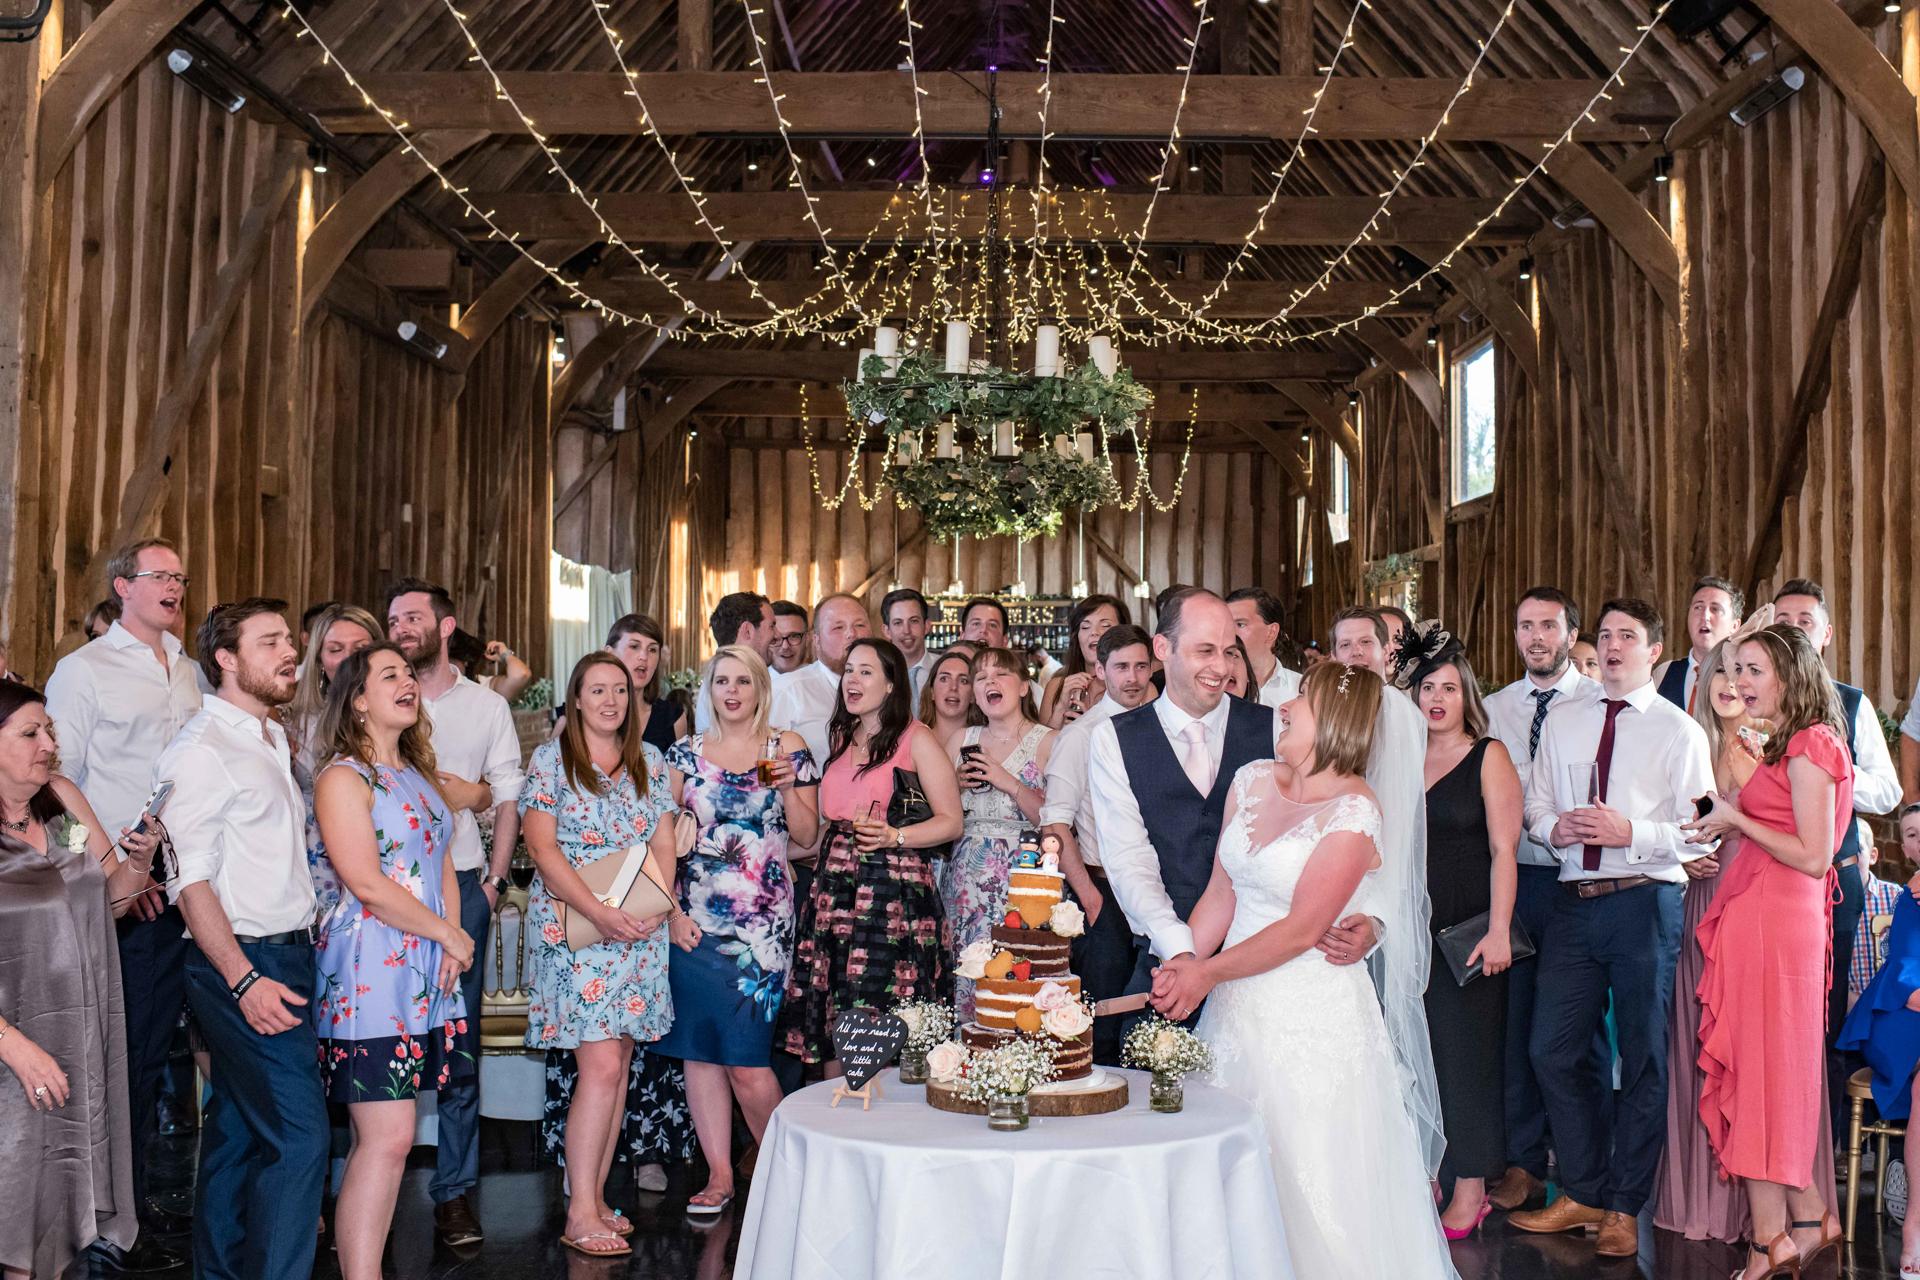 Lillibrook Manor Barn Wedding, Maidenhead, Alexandria Hall Photography (74 of 82).jpg